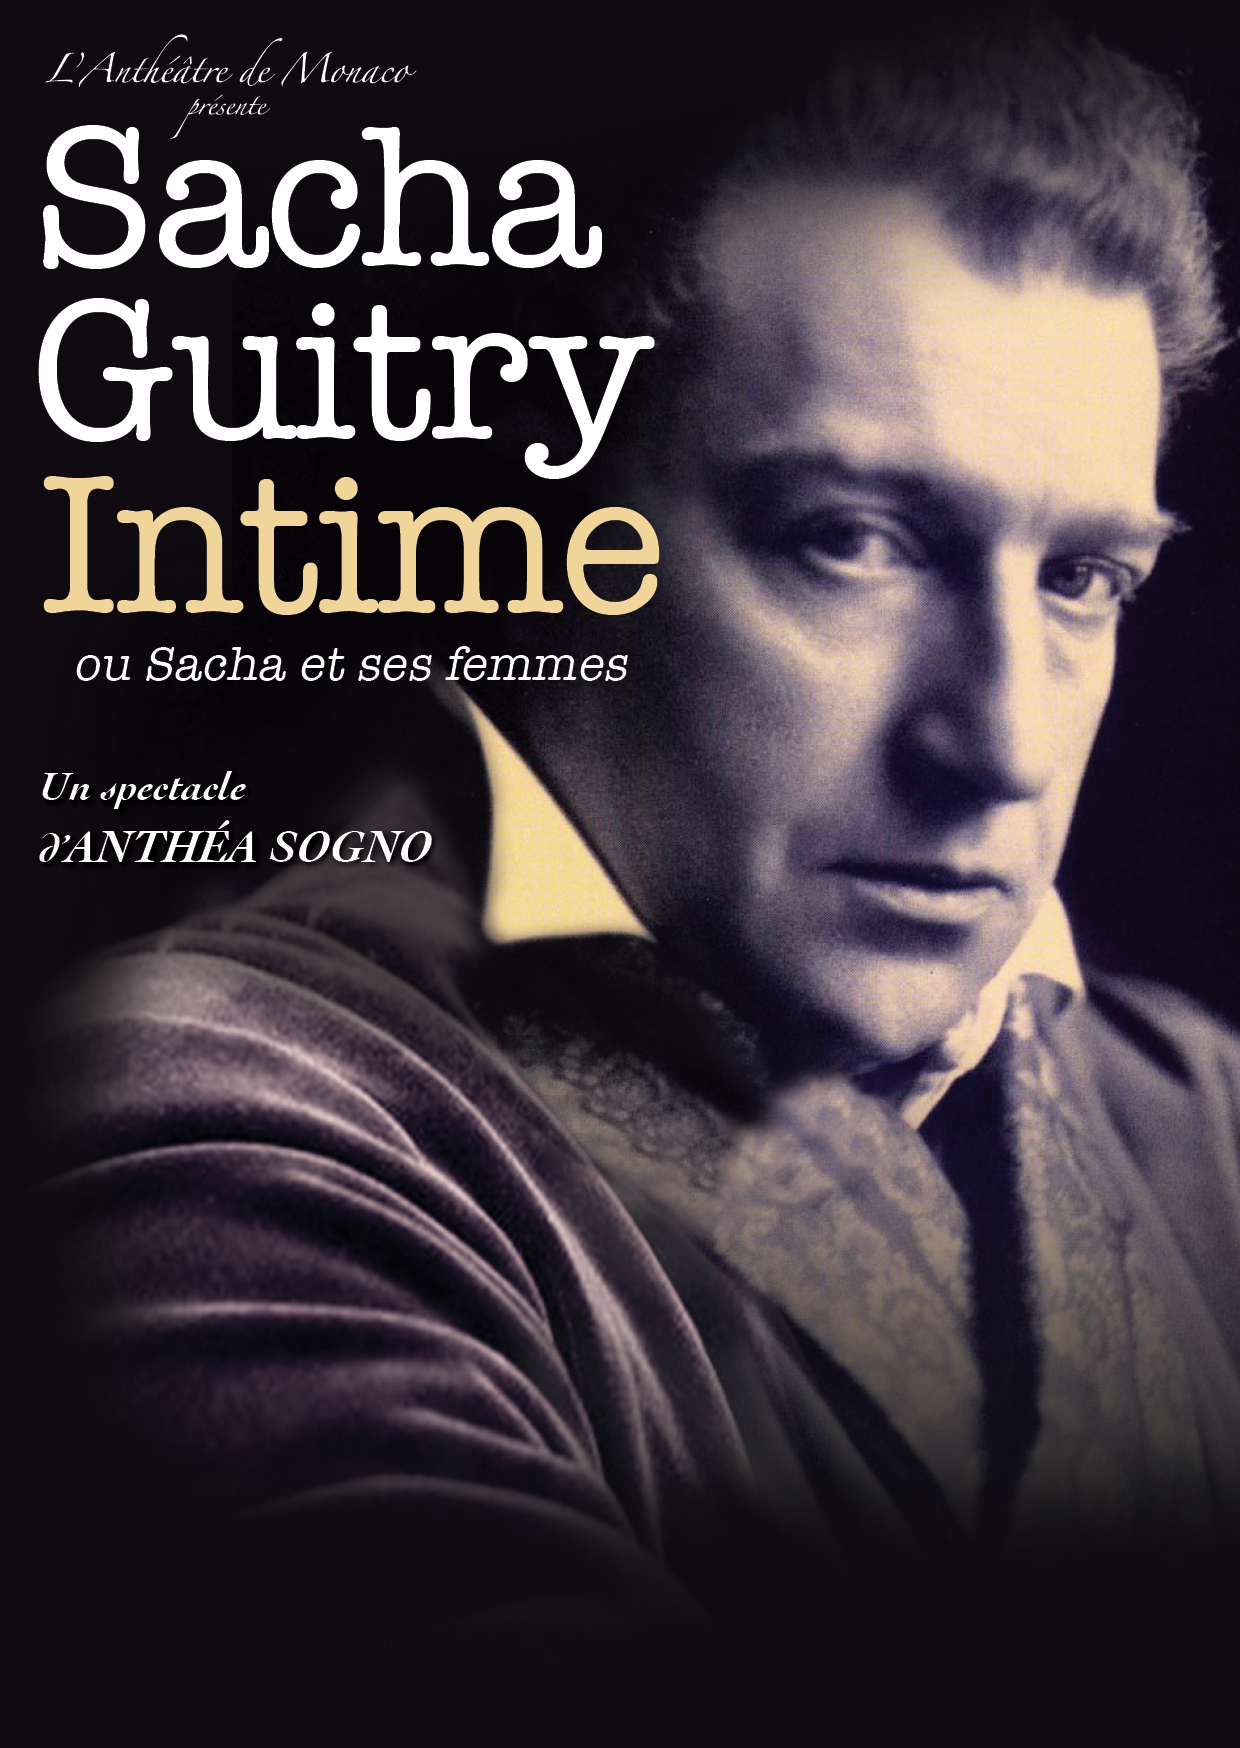 SACHA GUITRY INTIME - 20h15 - Salle Juliette Drouet / Carrée